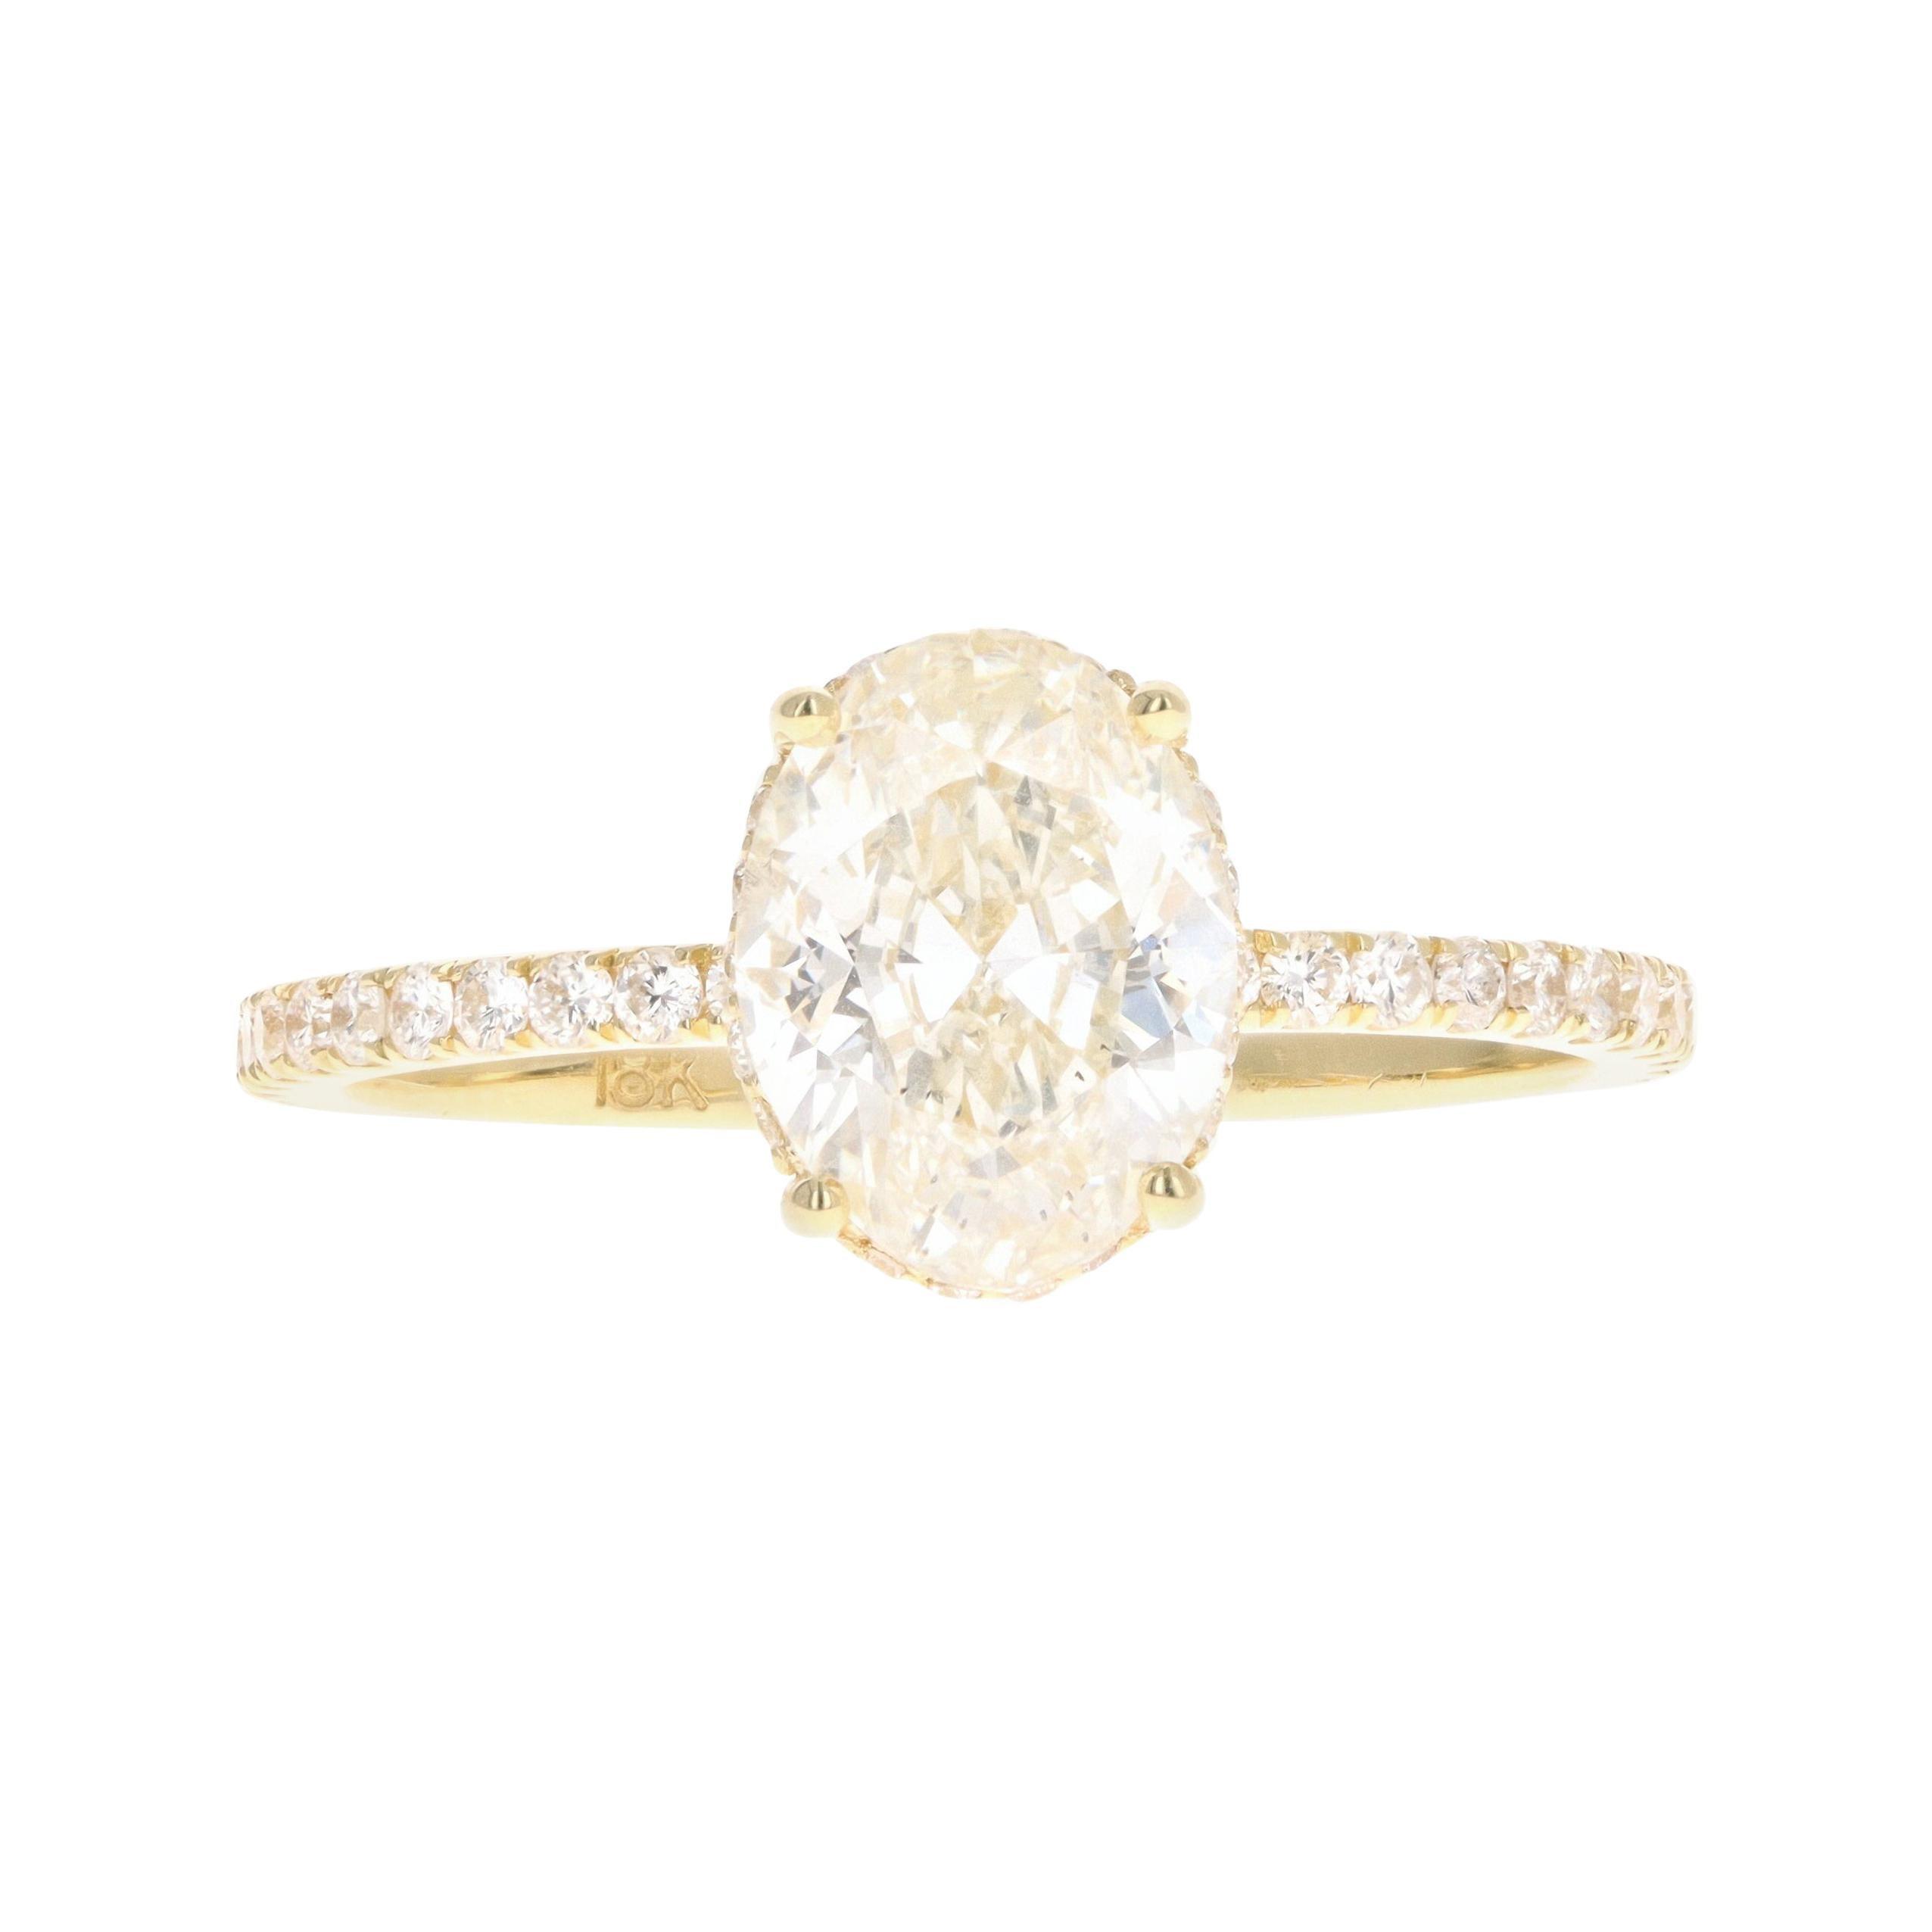 18K Yellow Gold 1.50 Carat Oval Cut Diamond Ring